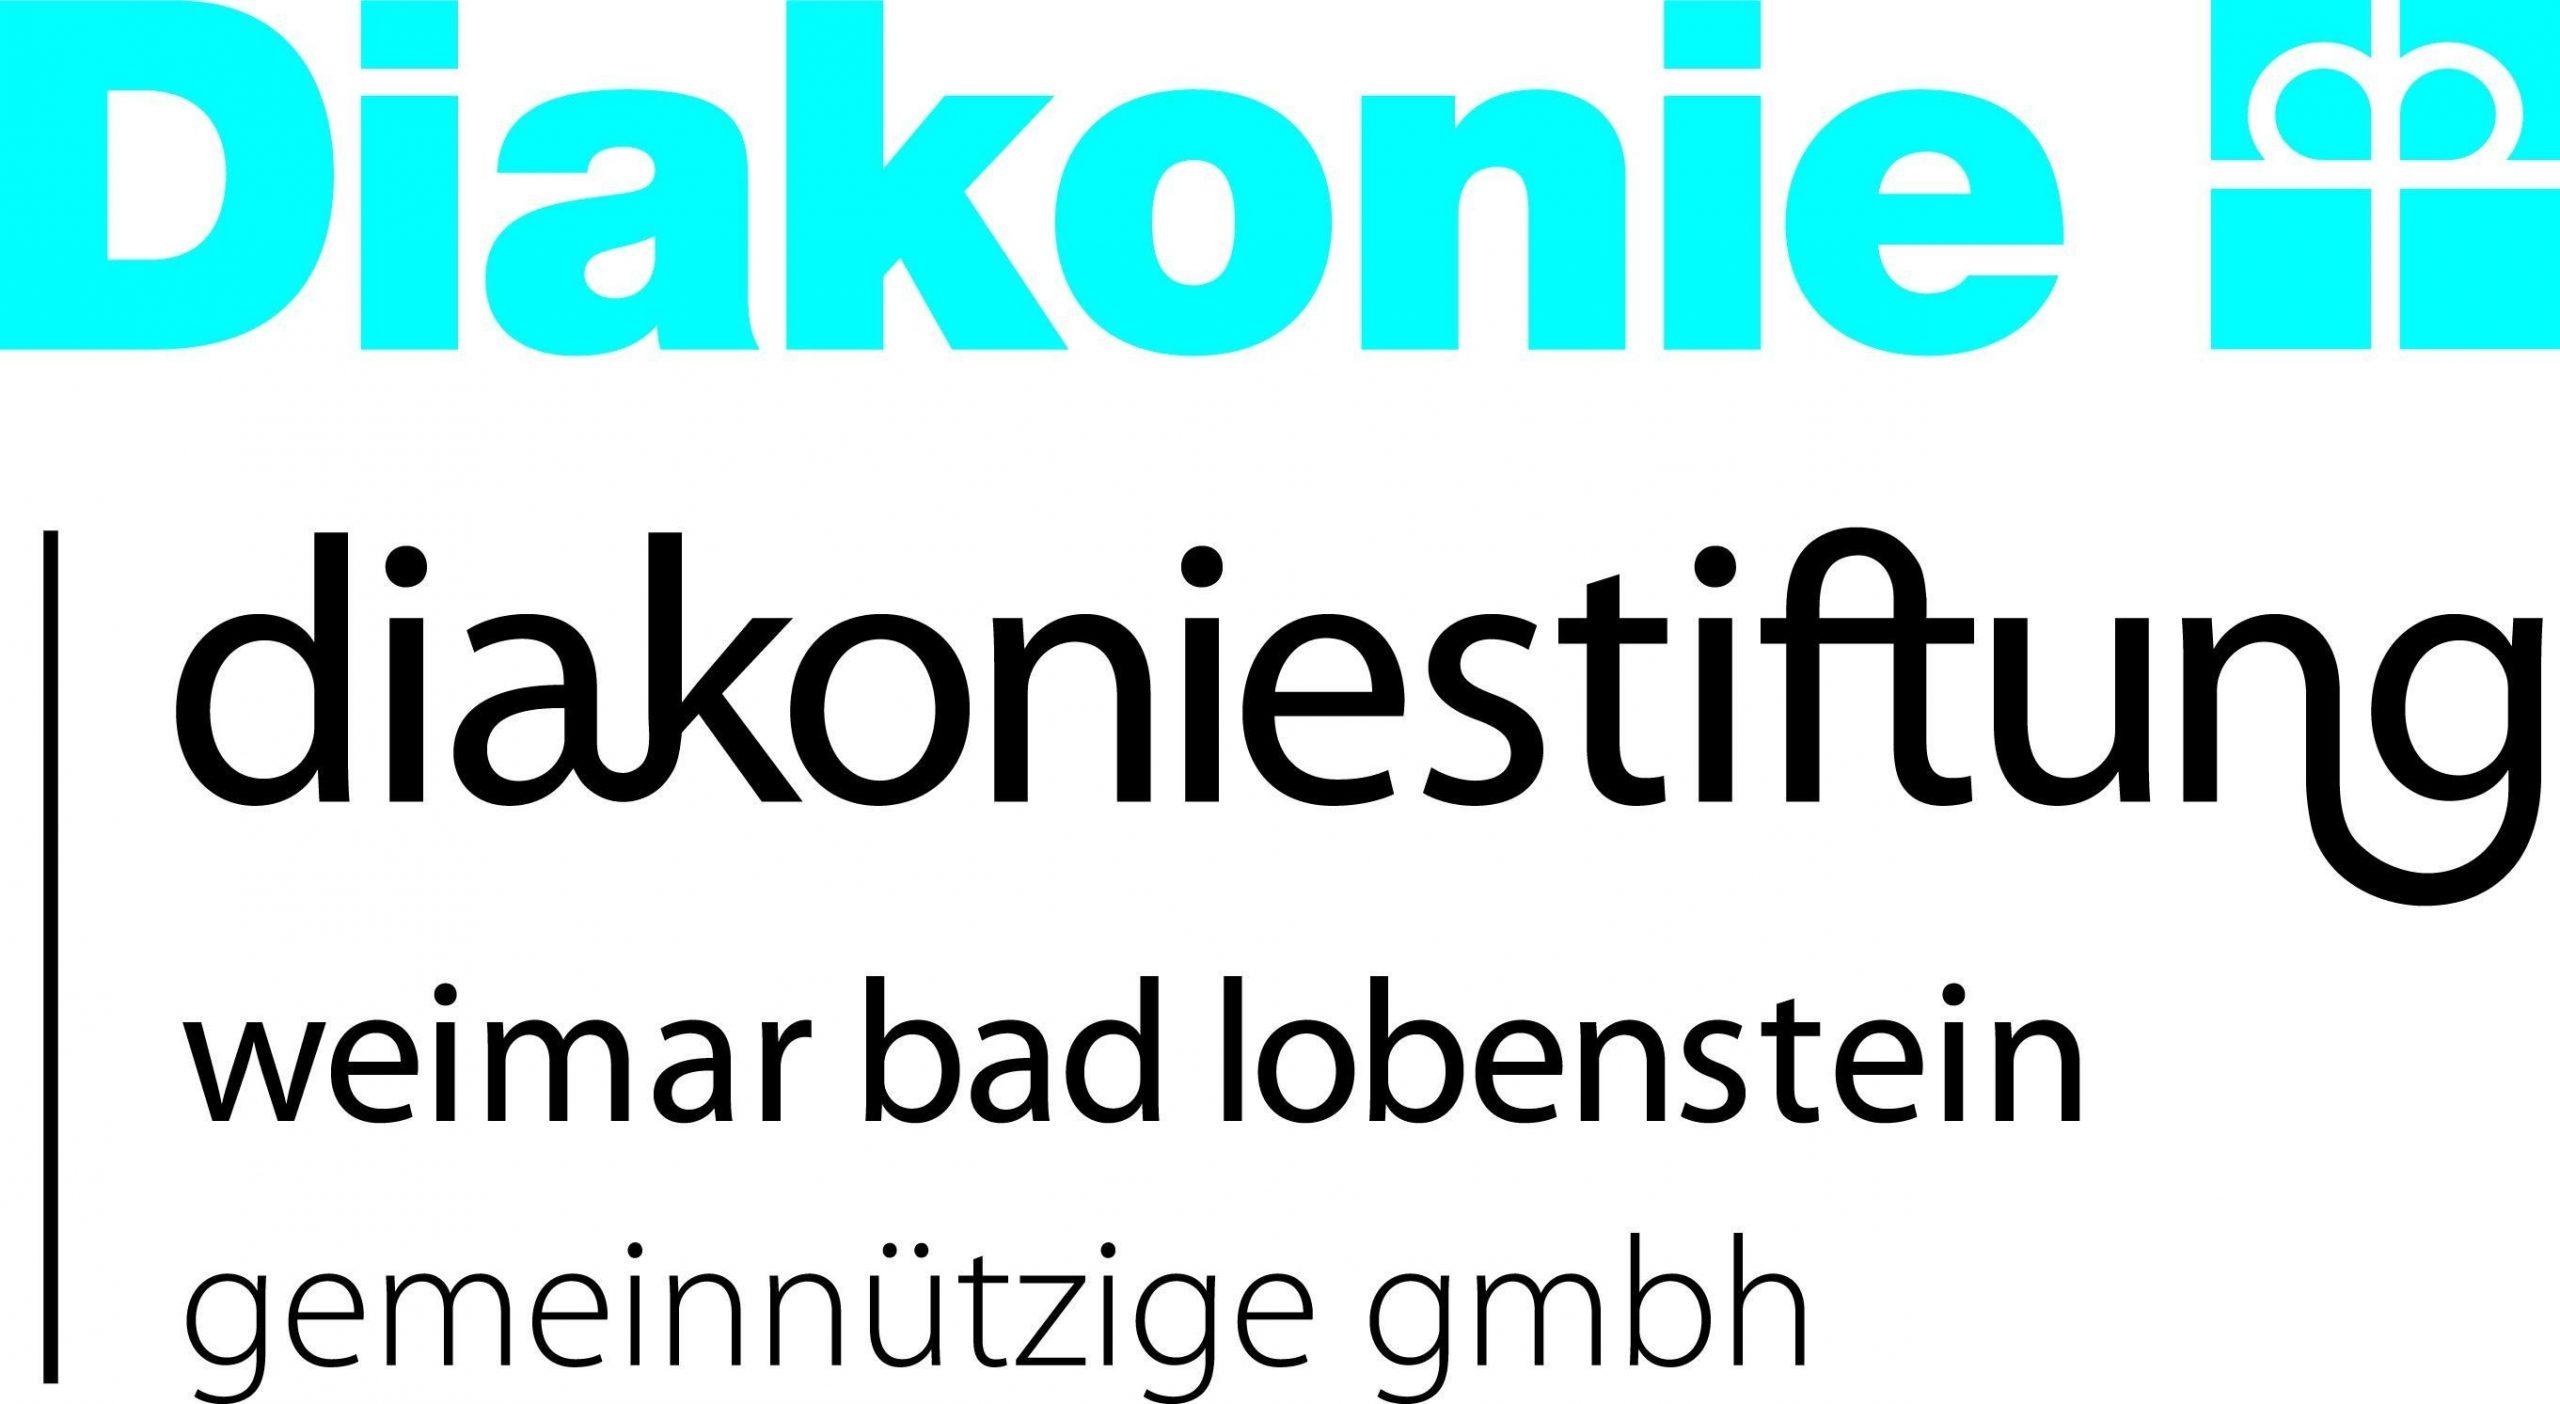 Logo Diakoniestiftung Weimar Bad Lobenstein